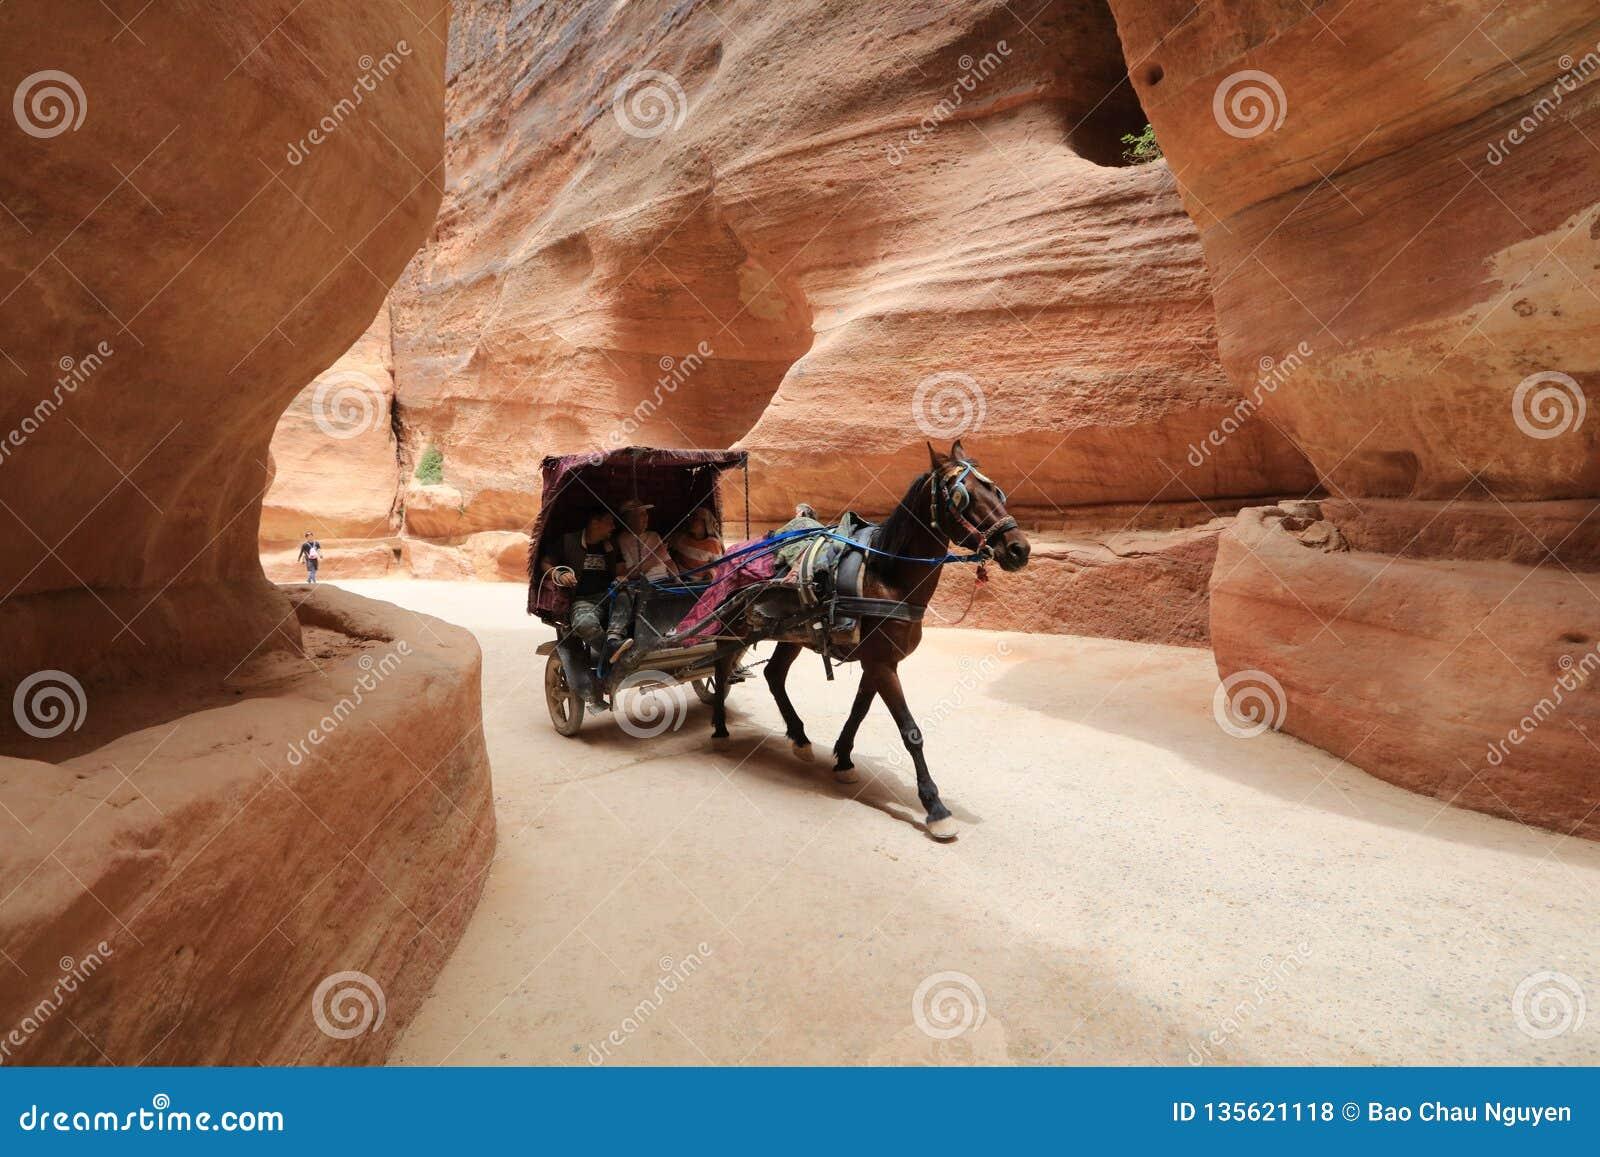 Petra - Jordan, a pre- Roman historic hideaway